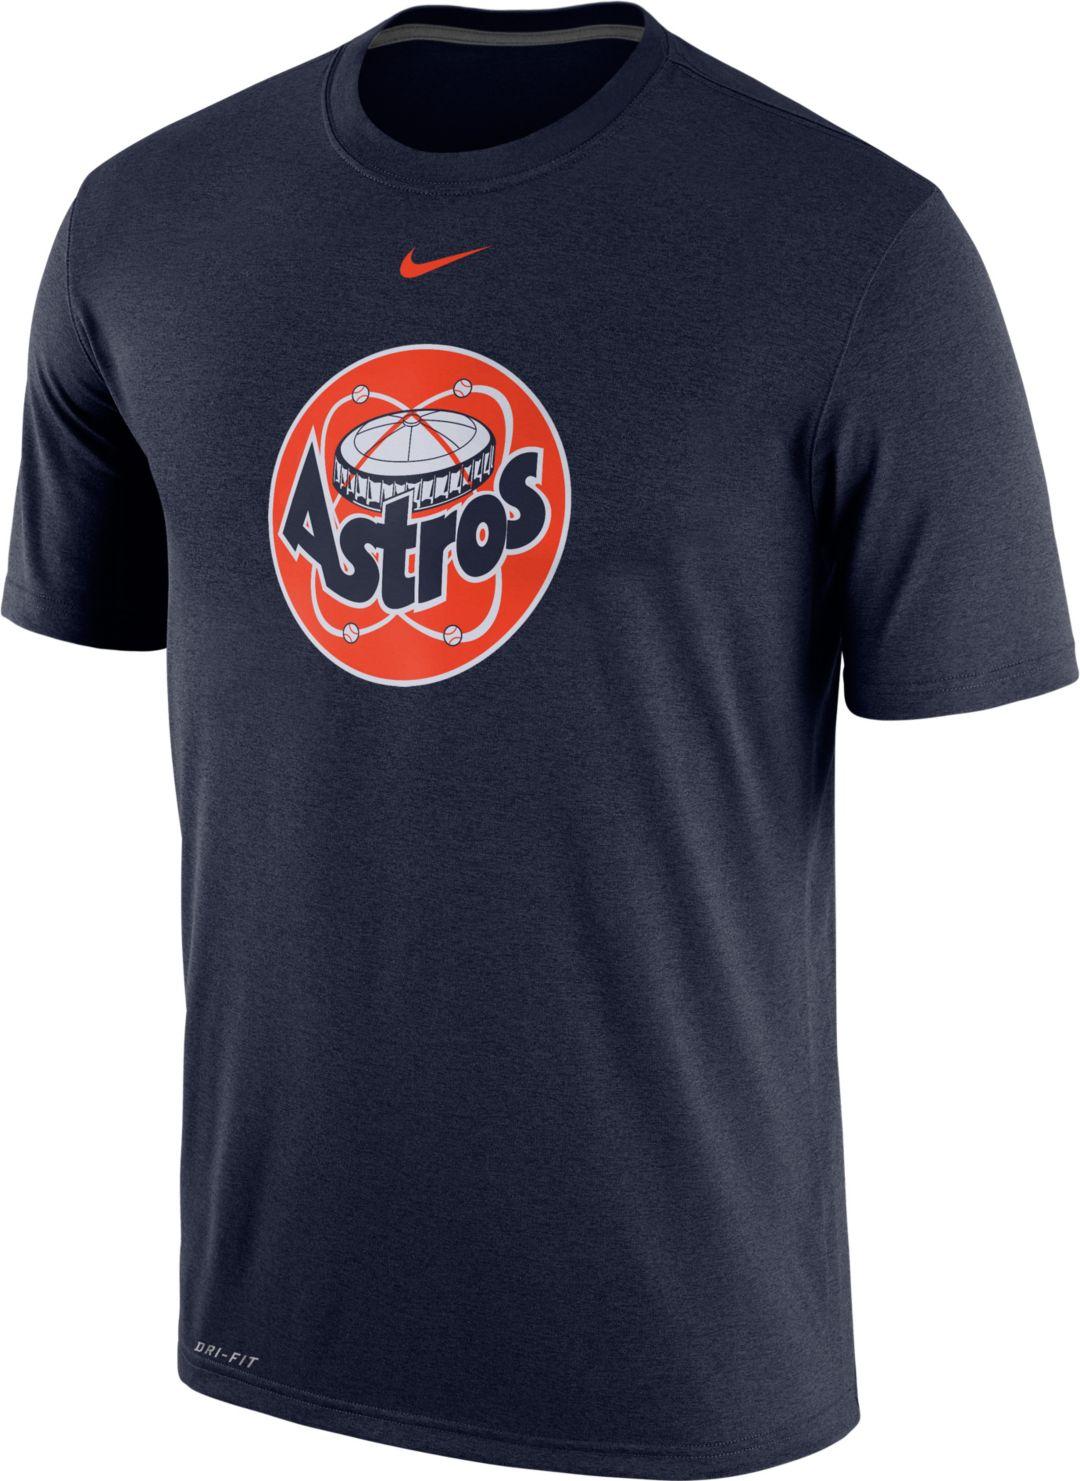 a5e0ade8 Nike Men's Houston Astros Dri-FIT Legend T-Shirt | DICK'S Sporting Goods